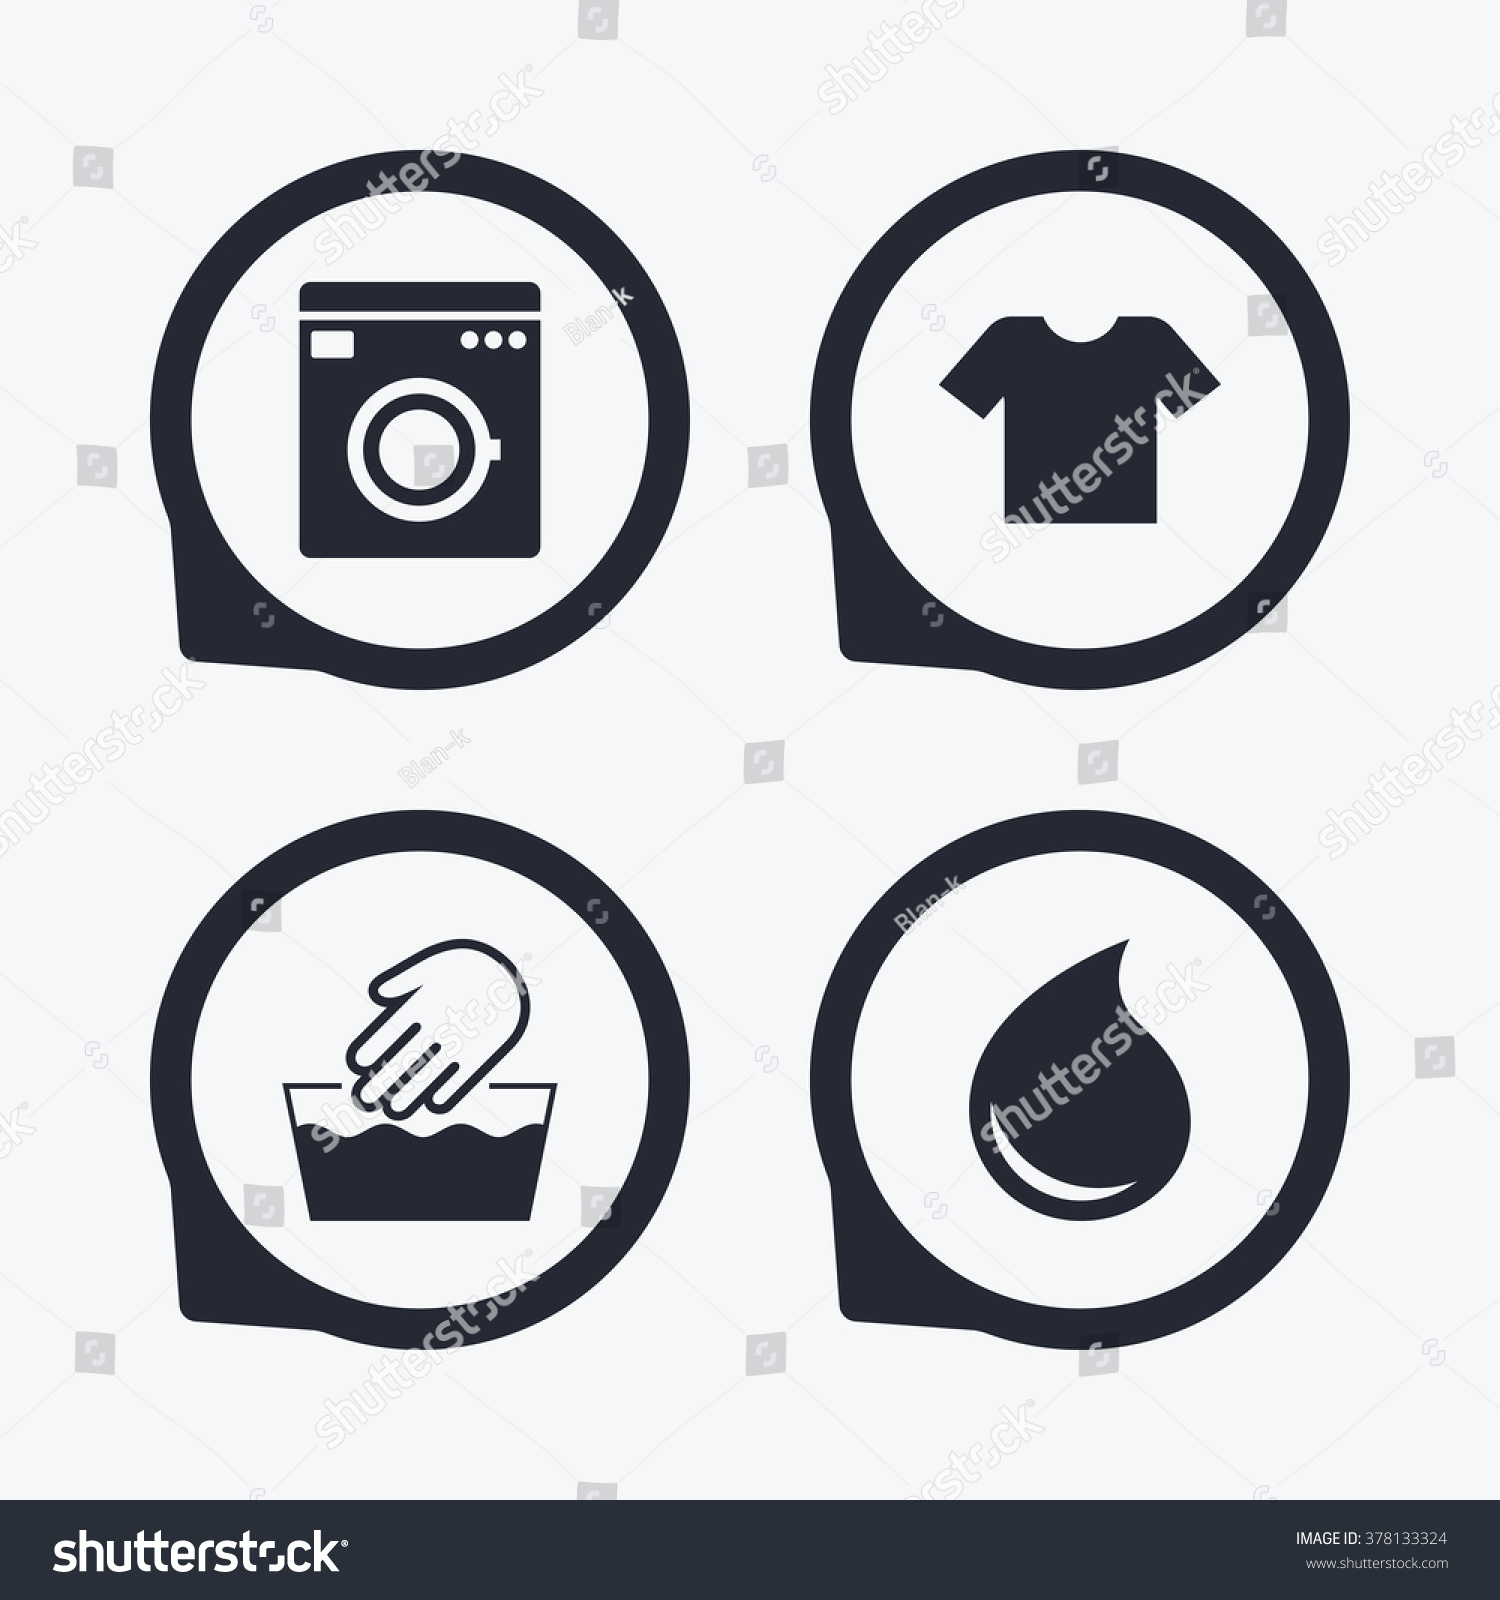 Wash machine icon hand wash tshirt stock vector 378133324 shutterstock wash machine icon hand wash t shirt clothes symbol laundry washhouse and buycottarizona Image collections